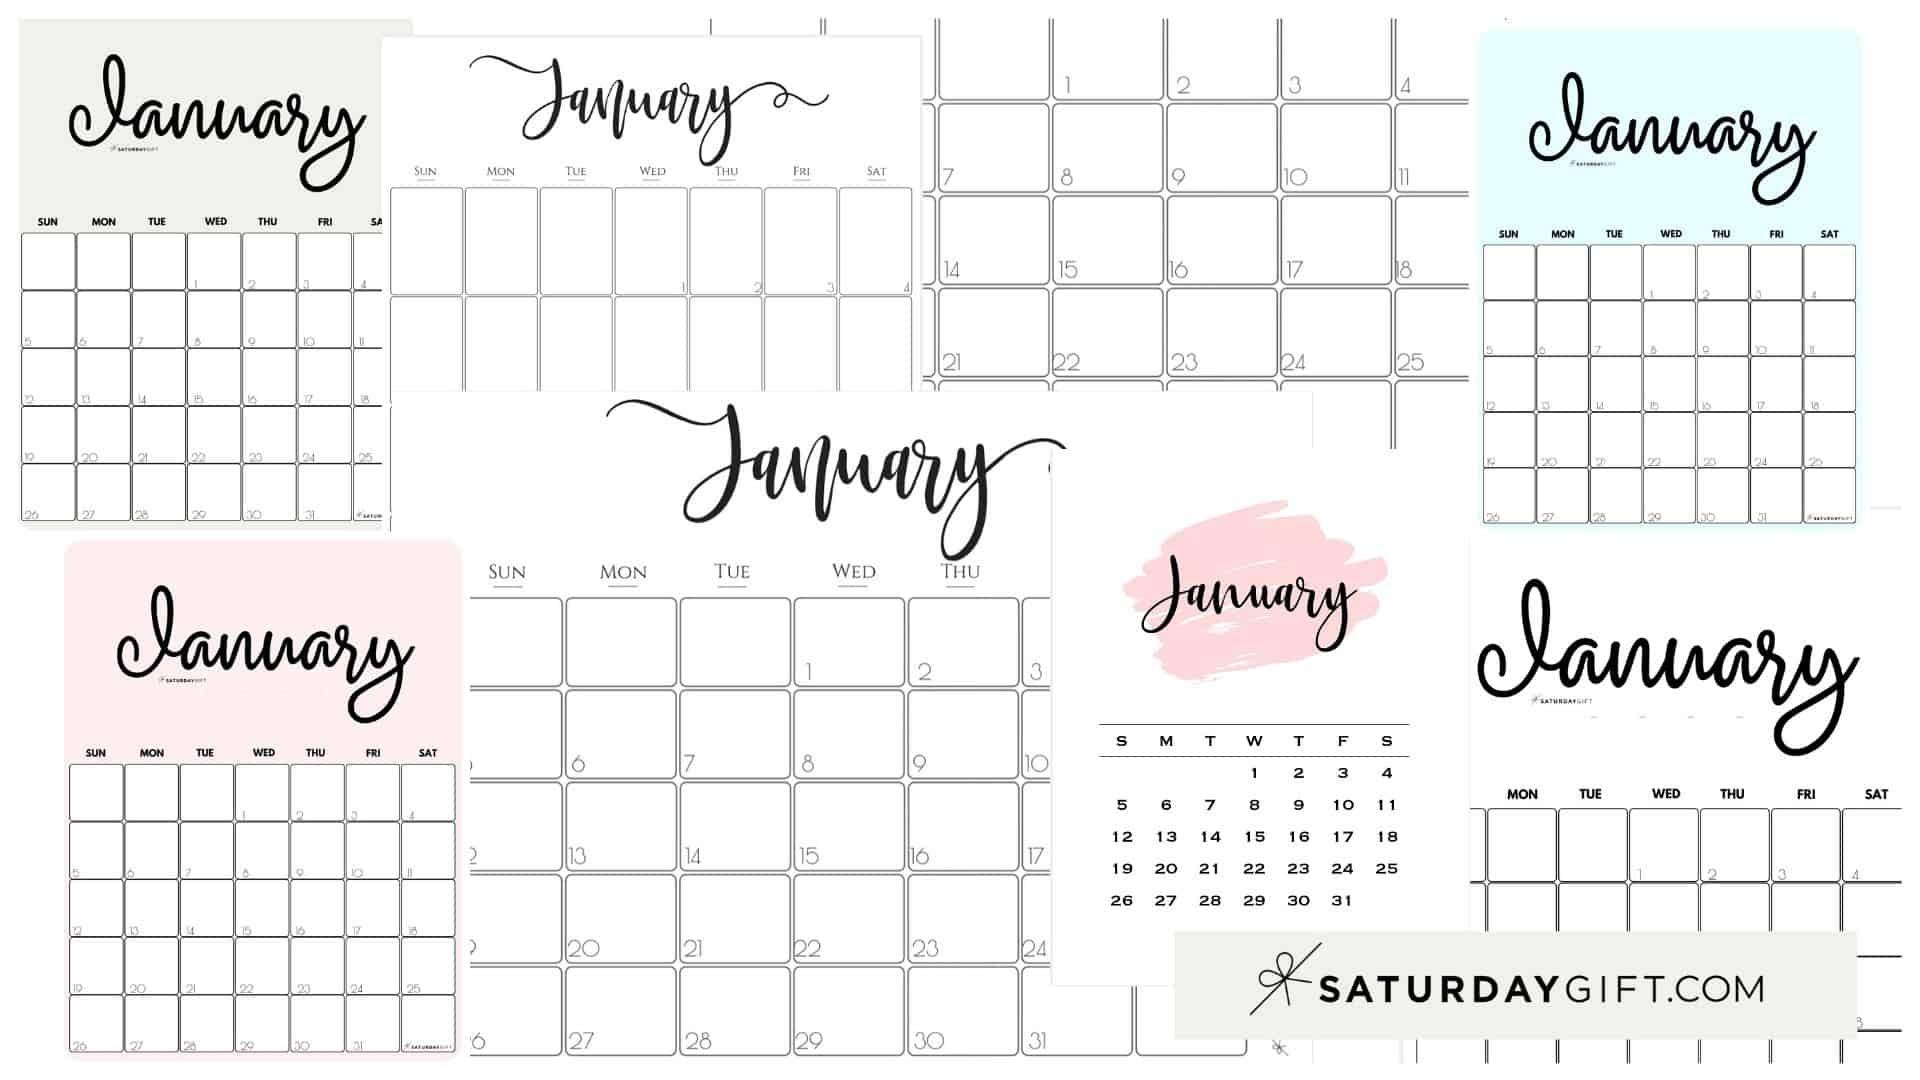 Take Monthly 2021 Printable Calendars